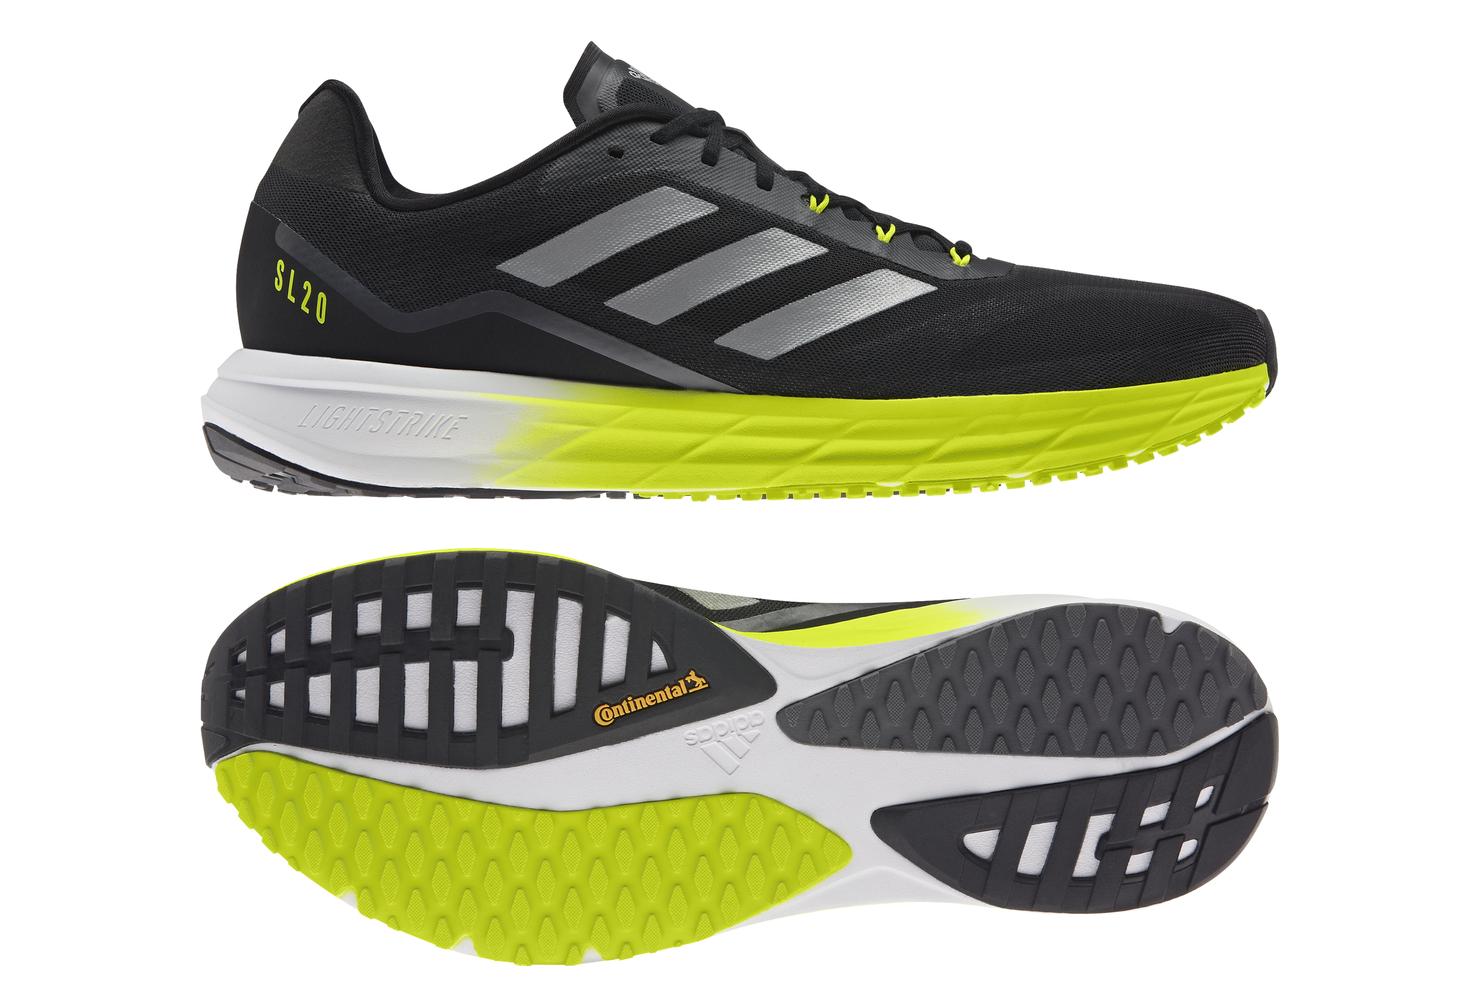 Adidas SL20 2 Running Shoes Black Yellow Mens